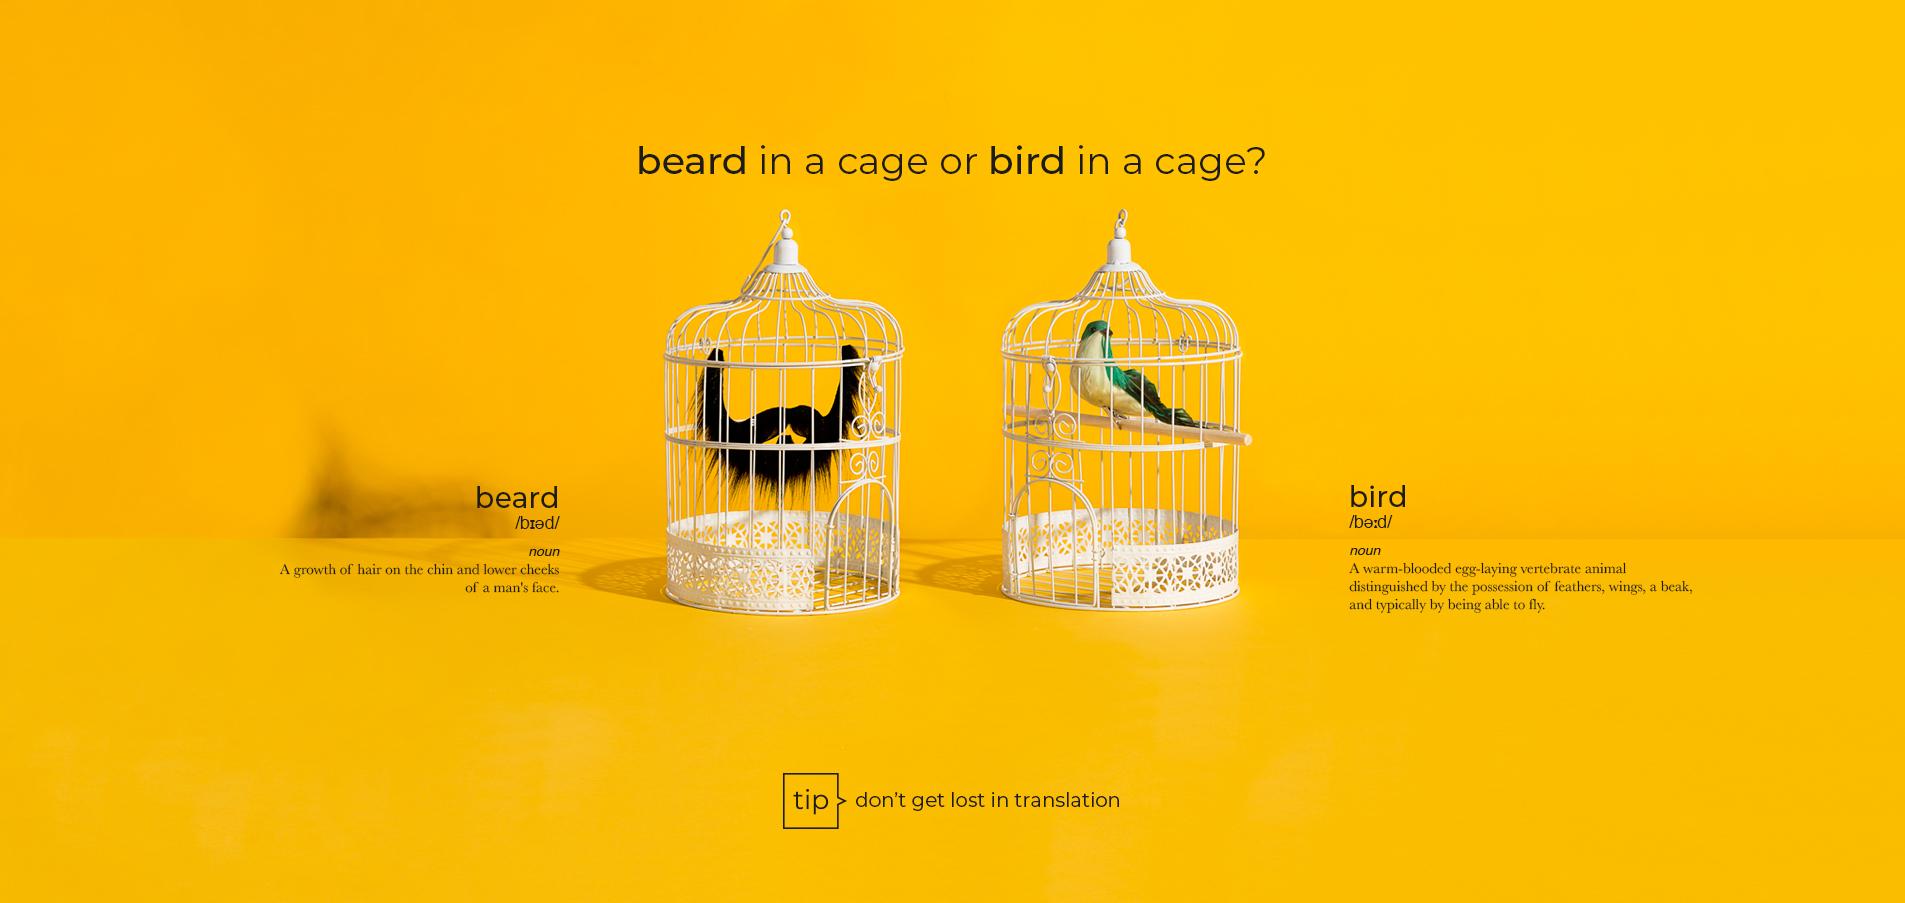 bear bird